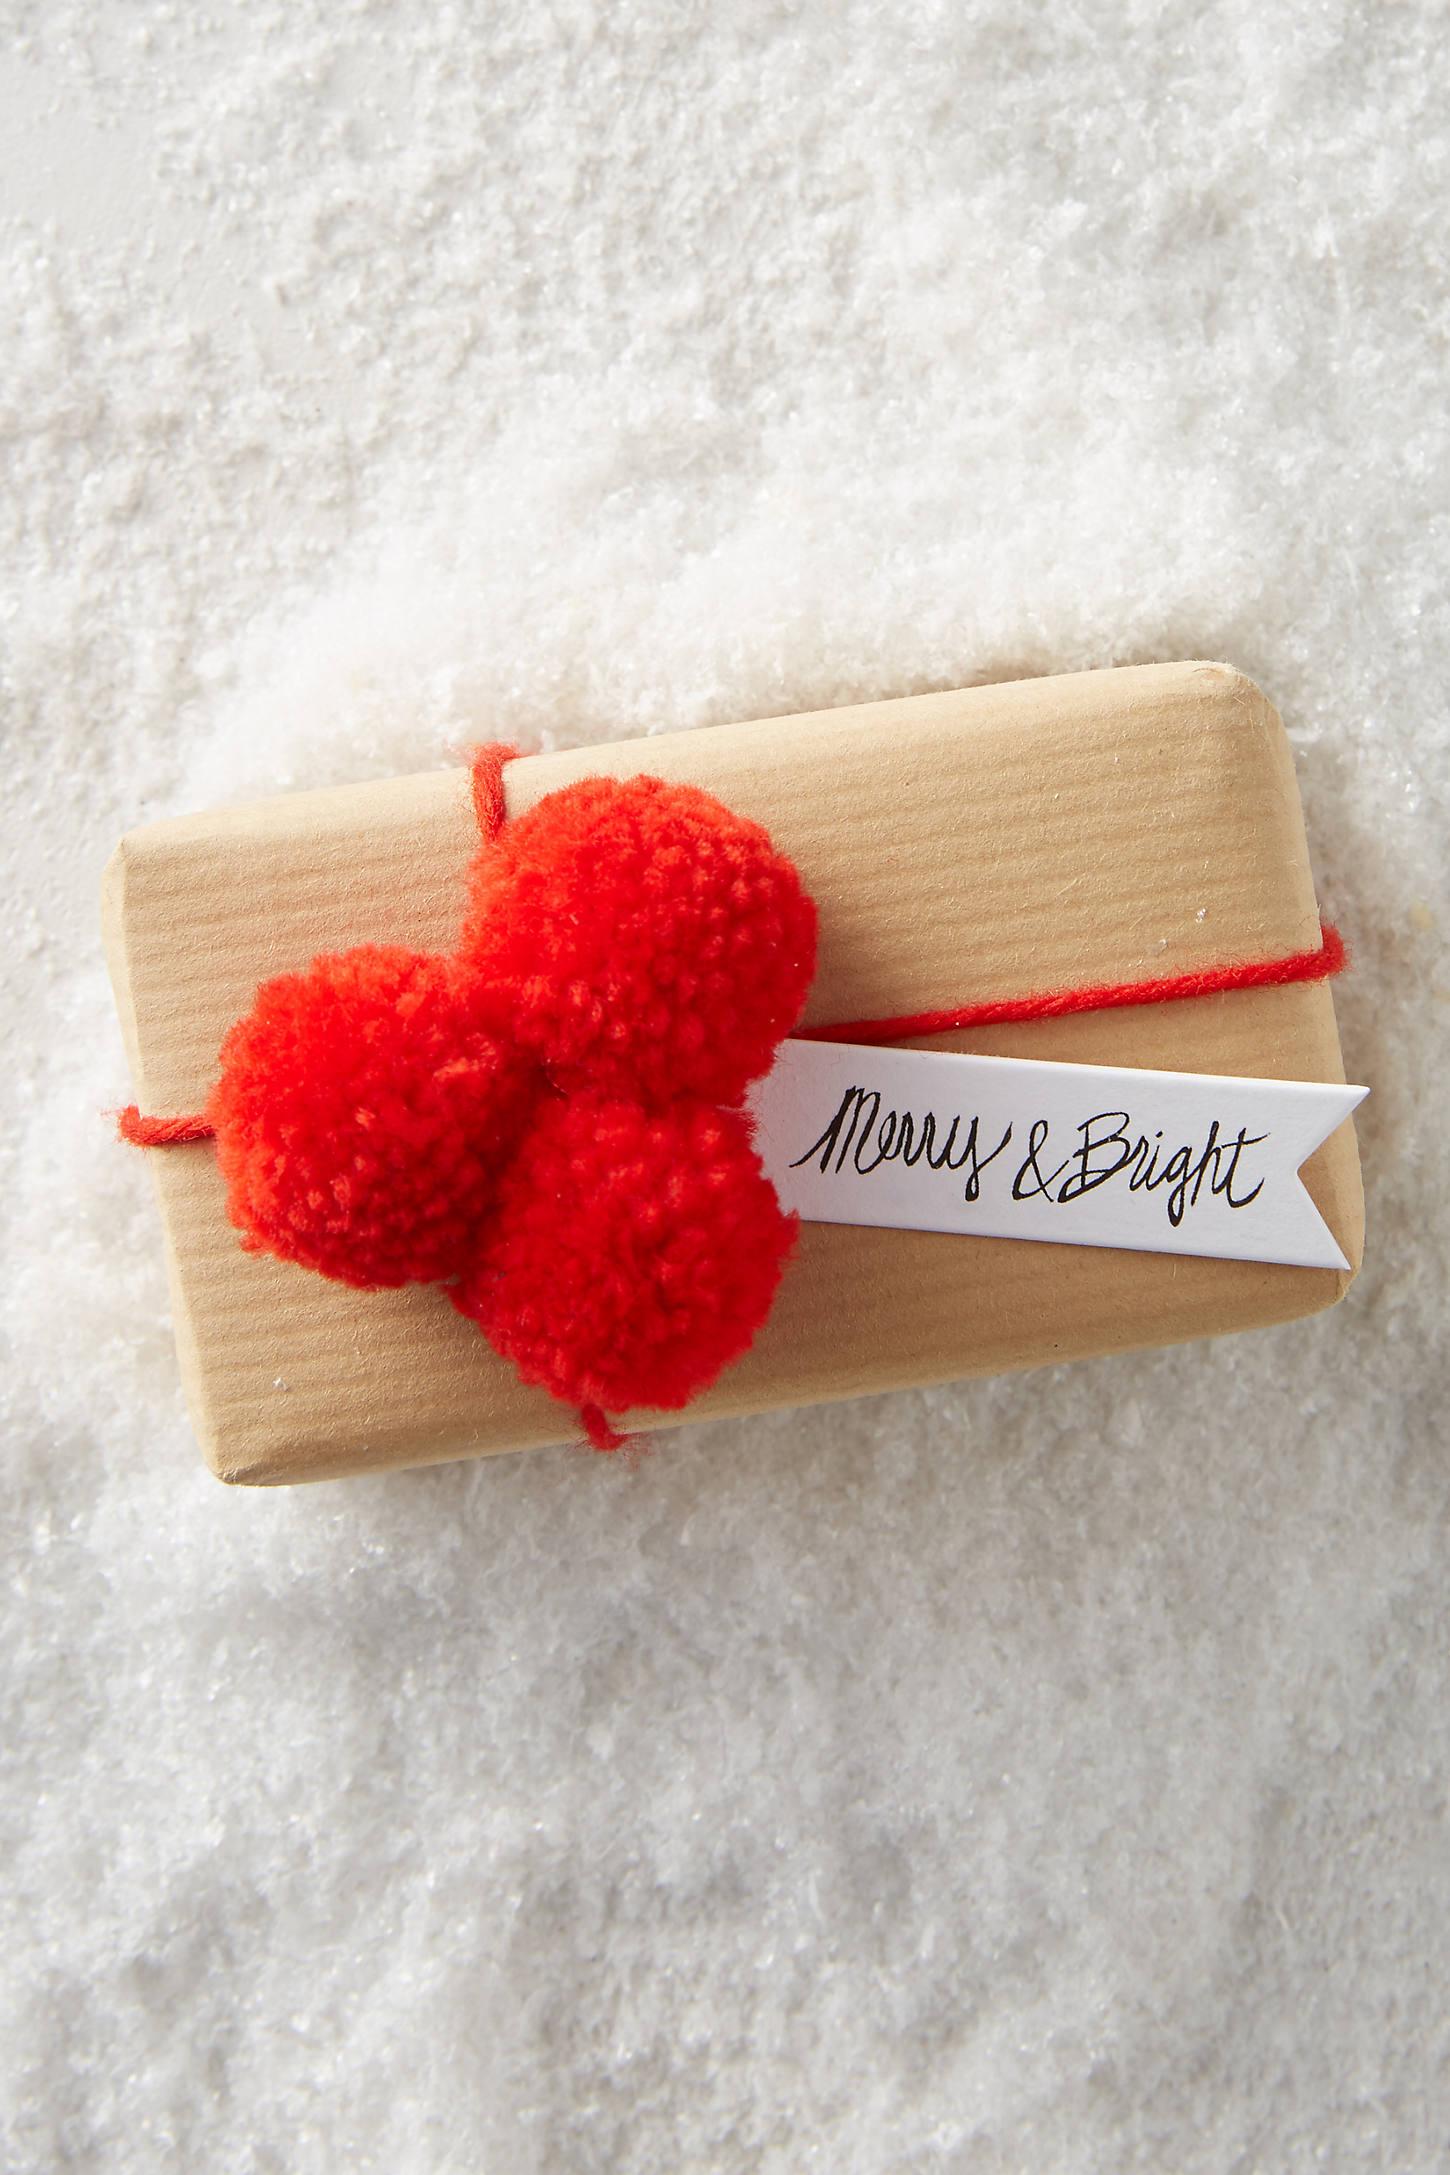 Pom-Pom Gifting Soap